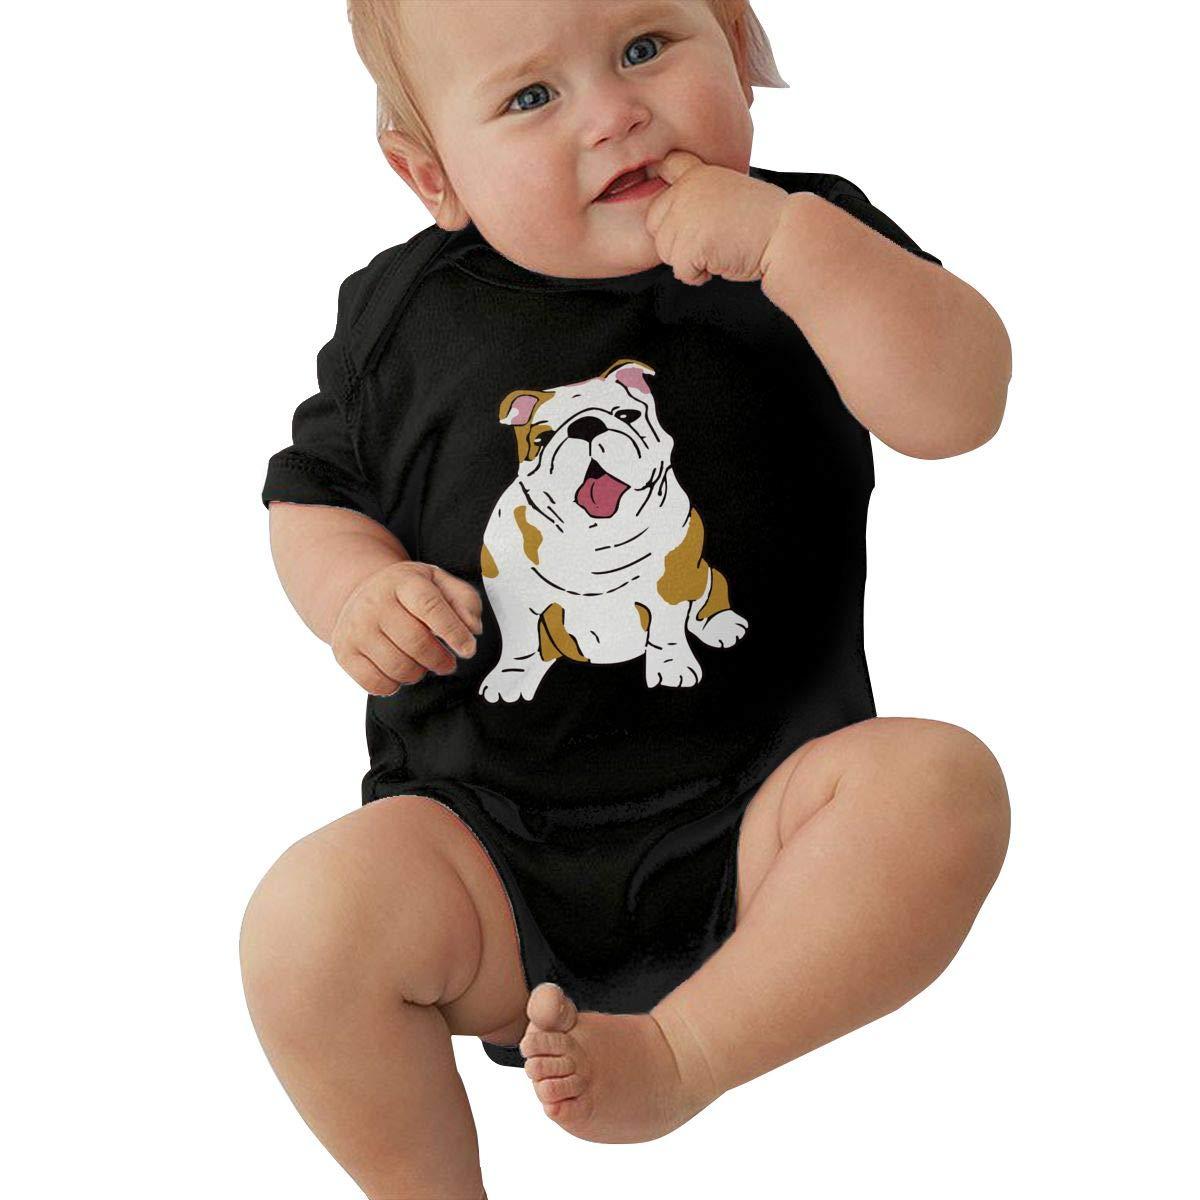 Fashion English Bulldog Sleepwear U88oi-8 Short Sleeve Cotton Rompers for Baby Boys and Girls